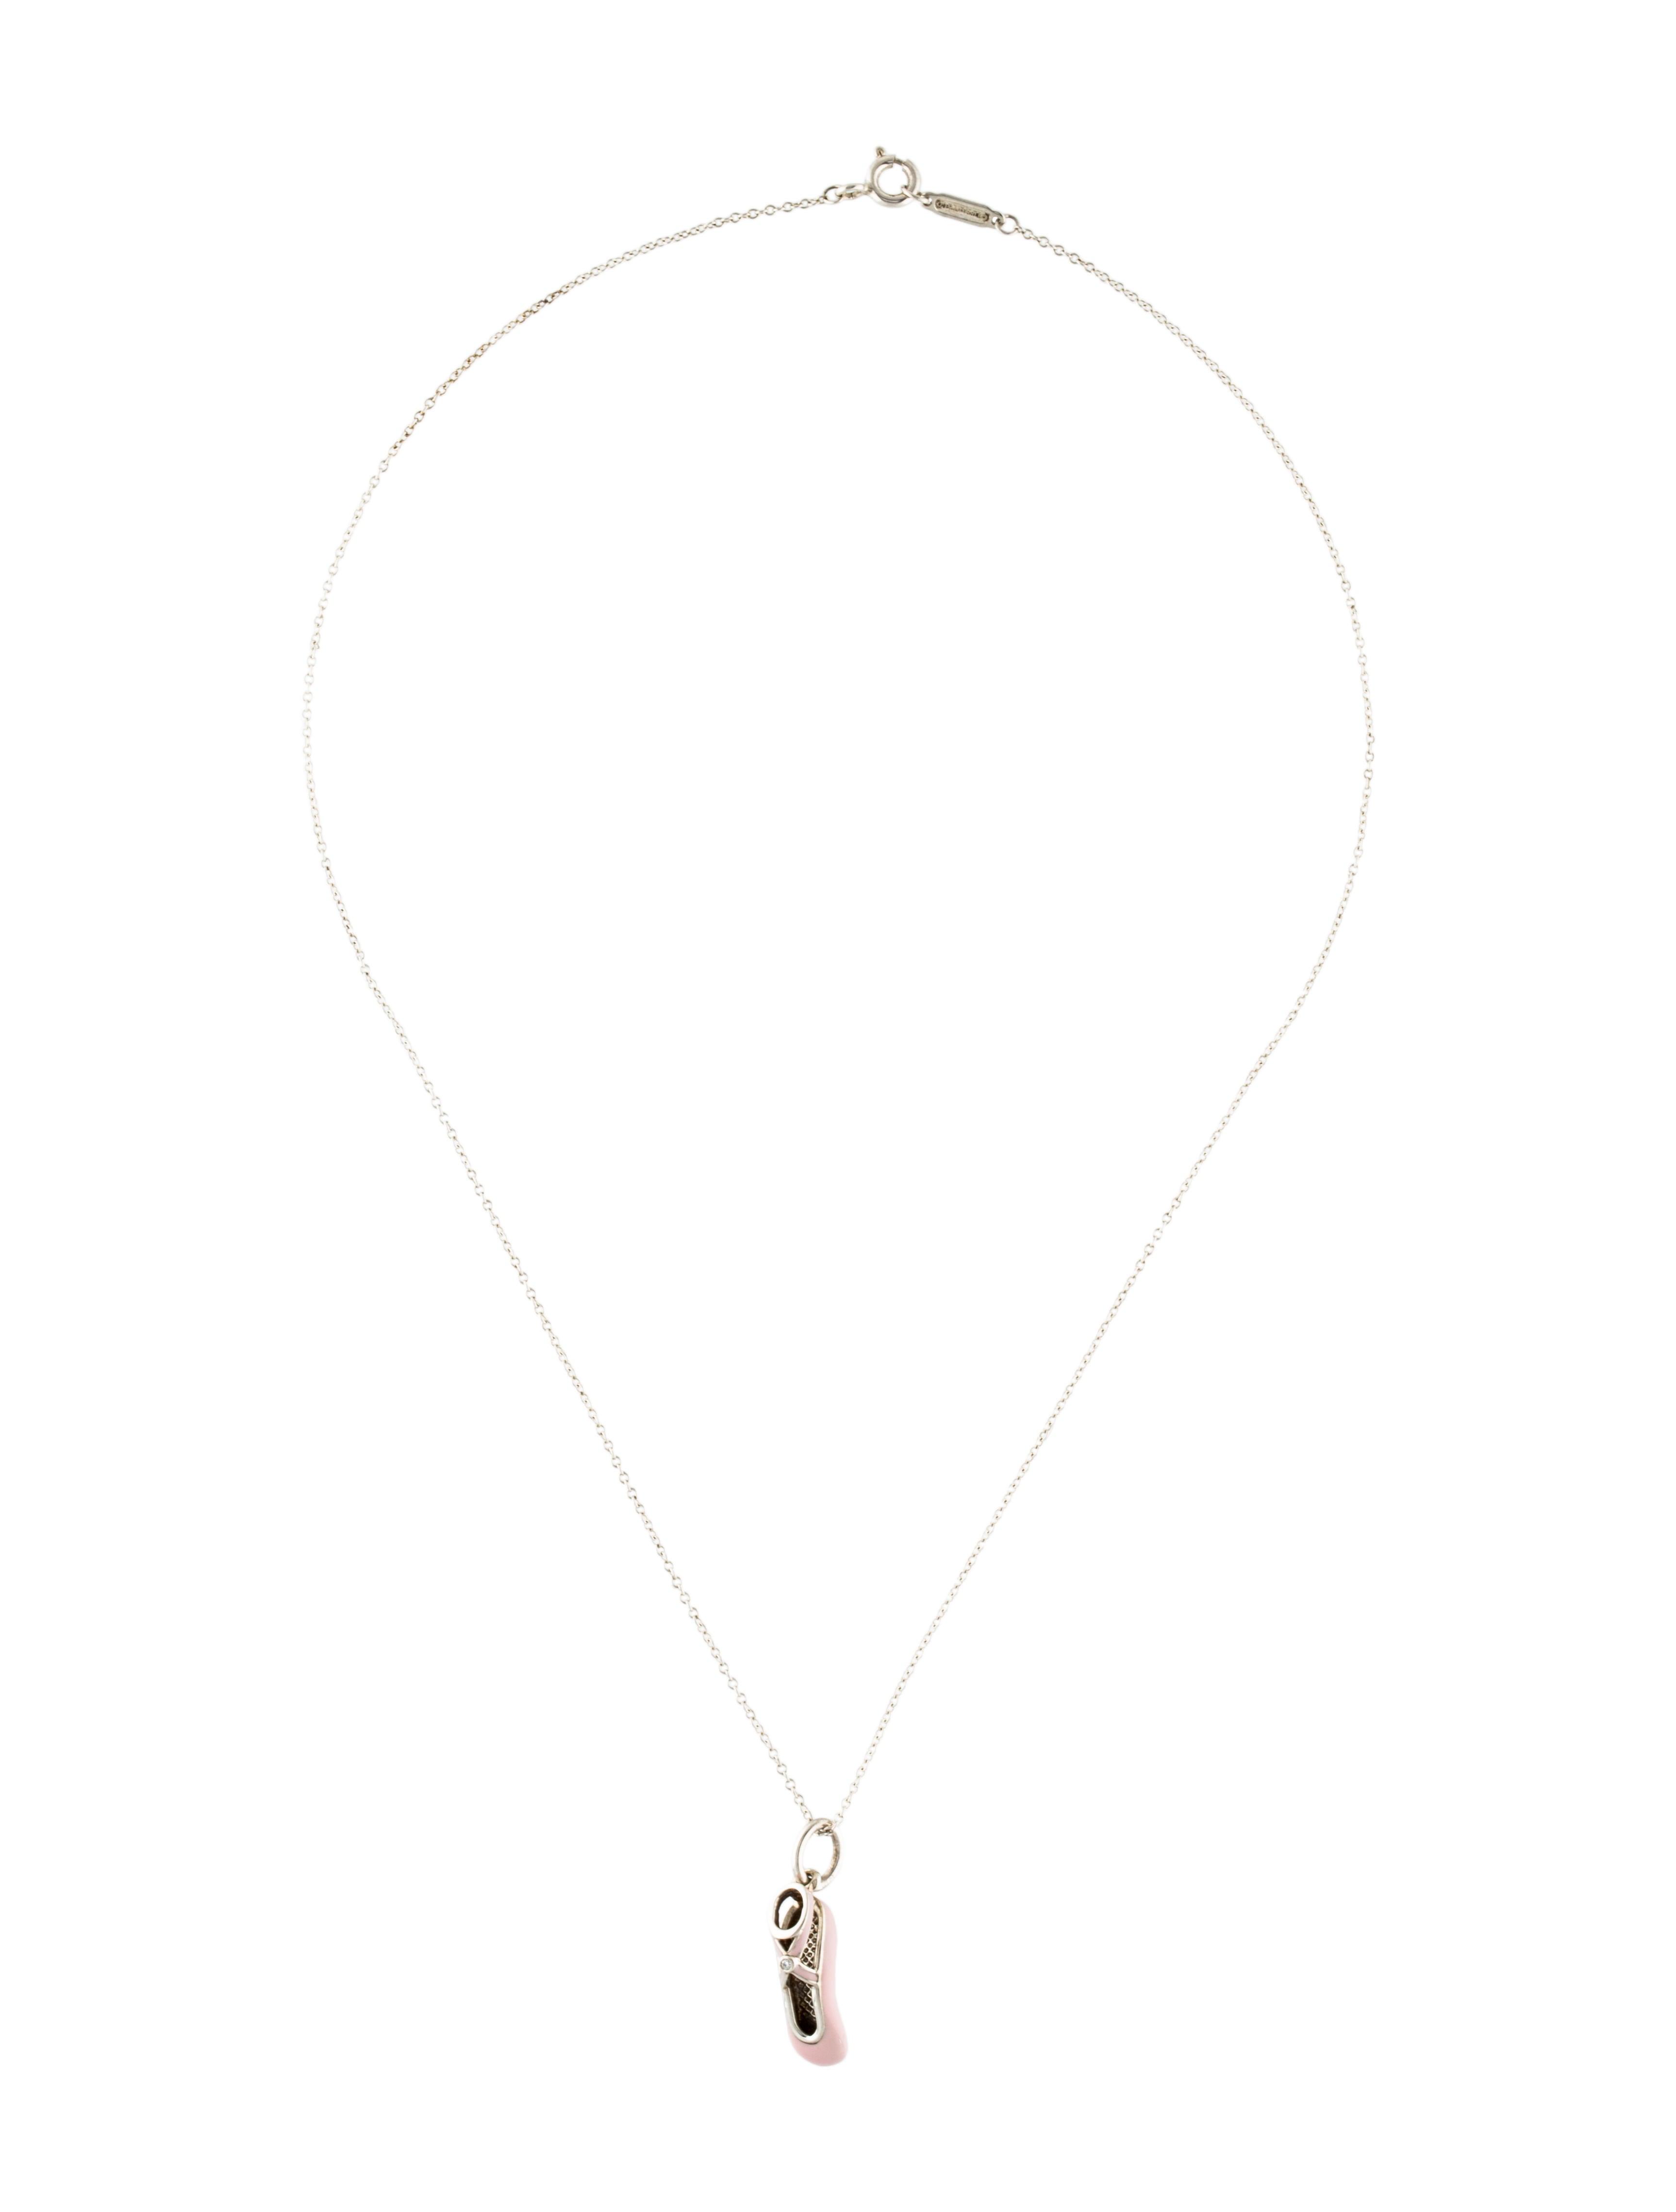 Tiffany co diamond enamel ballet slipper pendant necklace diamond enamel ballet slipper pendant necklace aloadofball Image collections